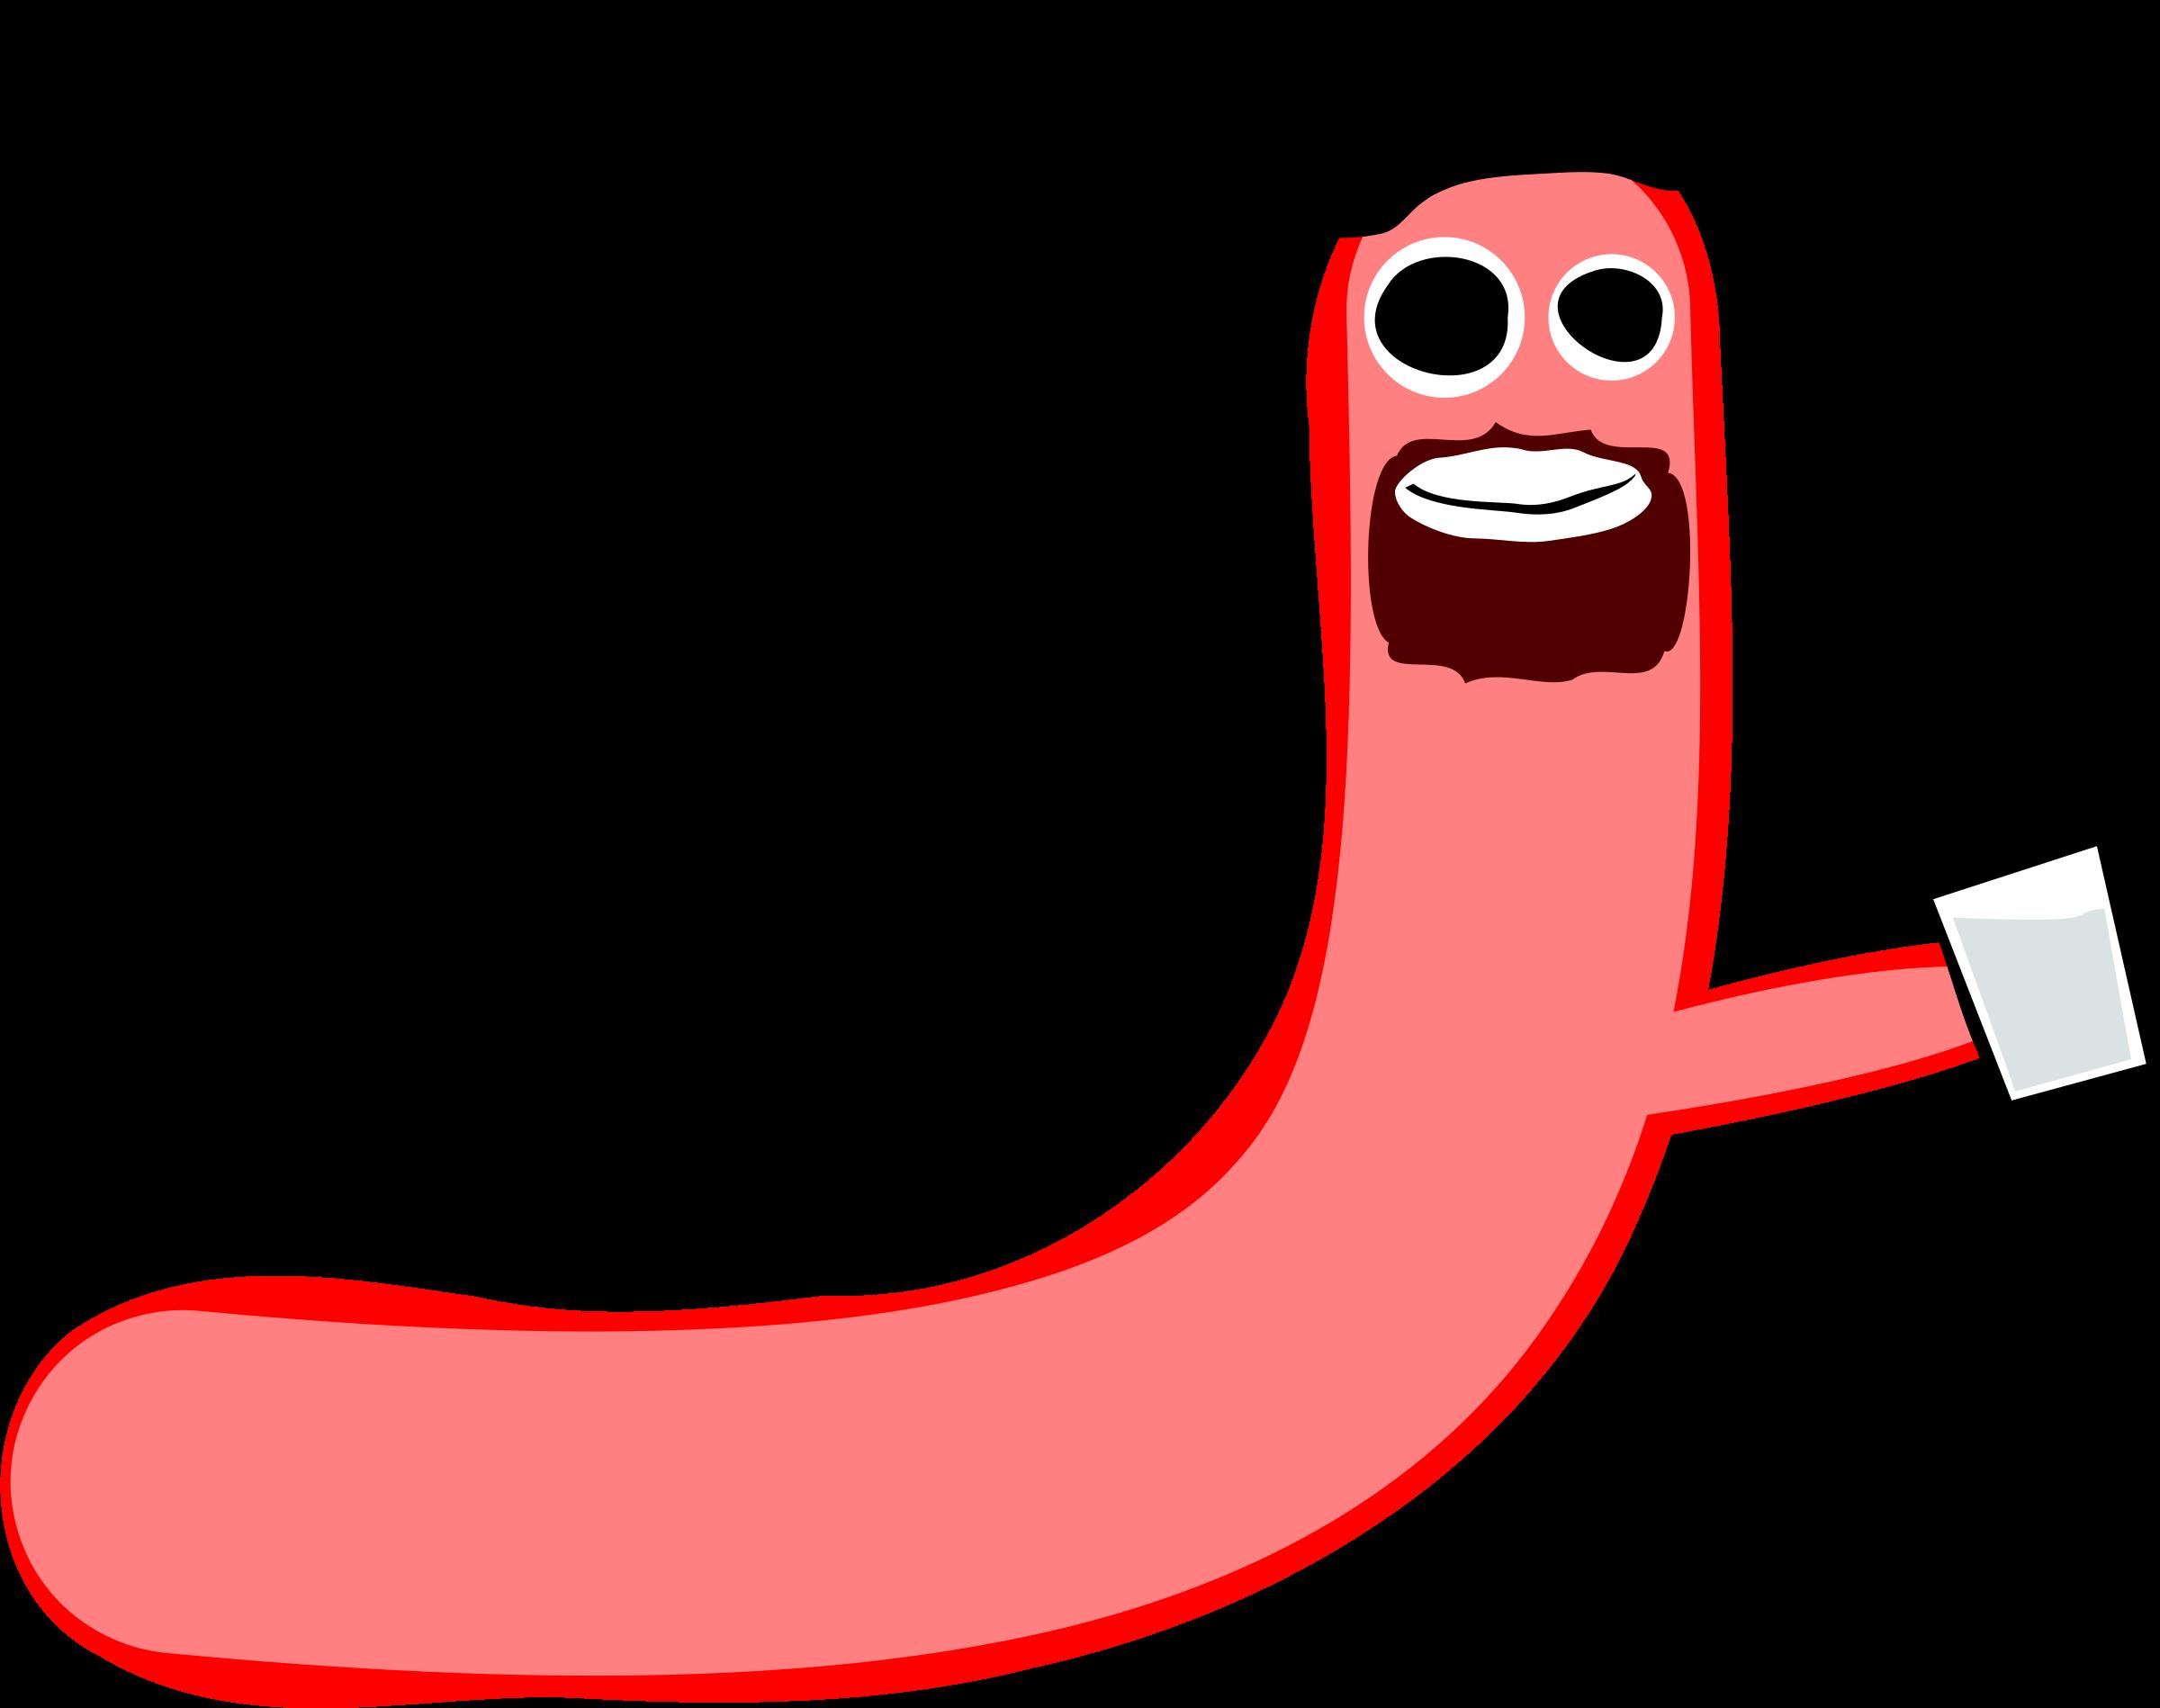 jpg free download Clipart sausage. Artist big image png